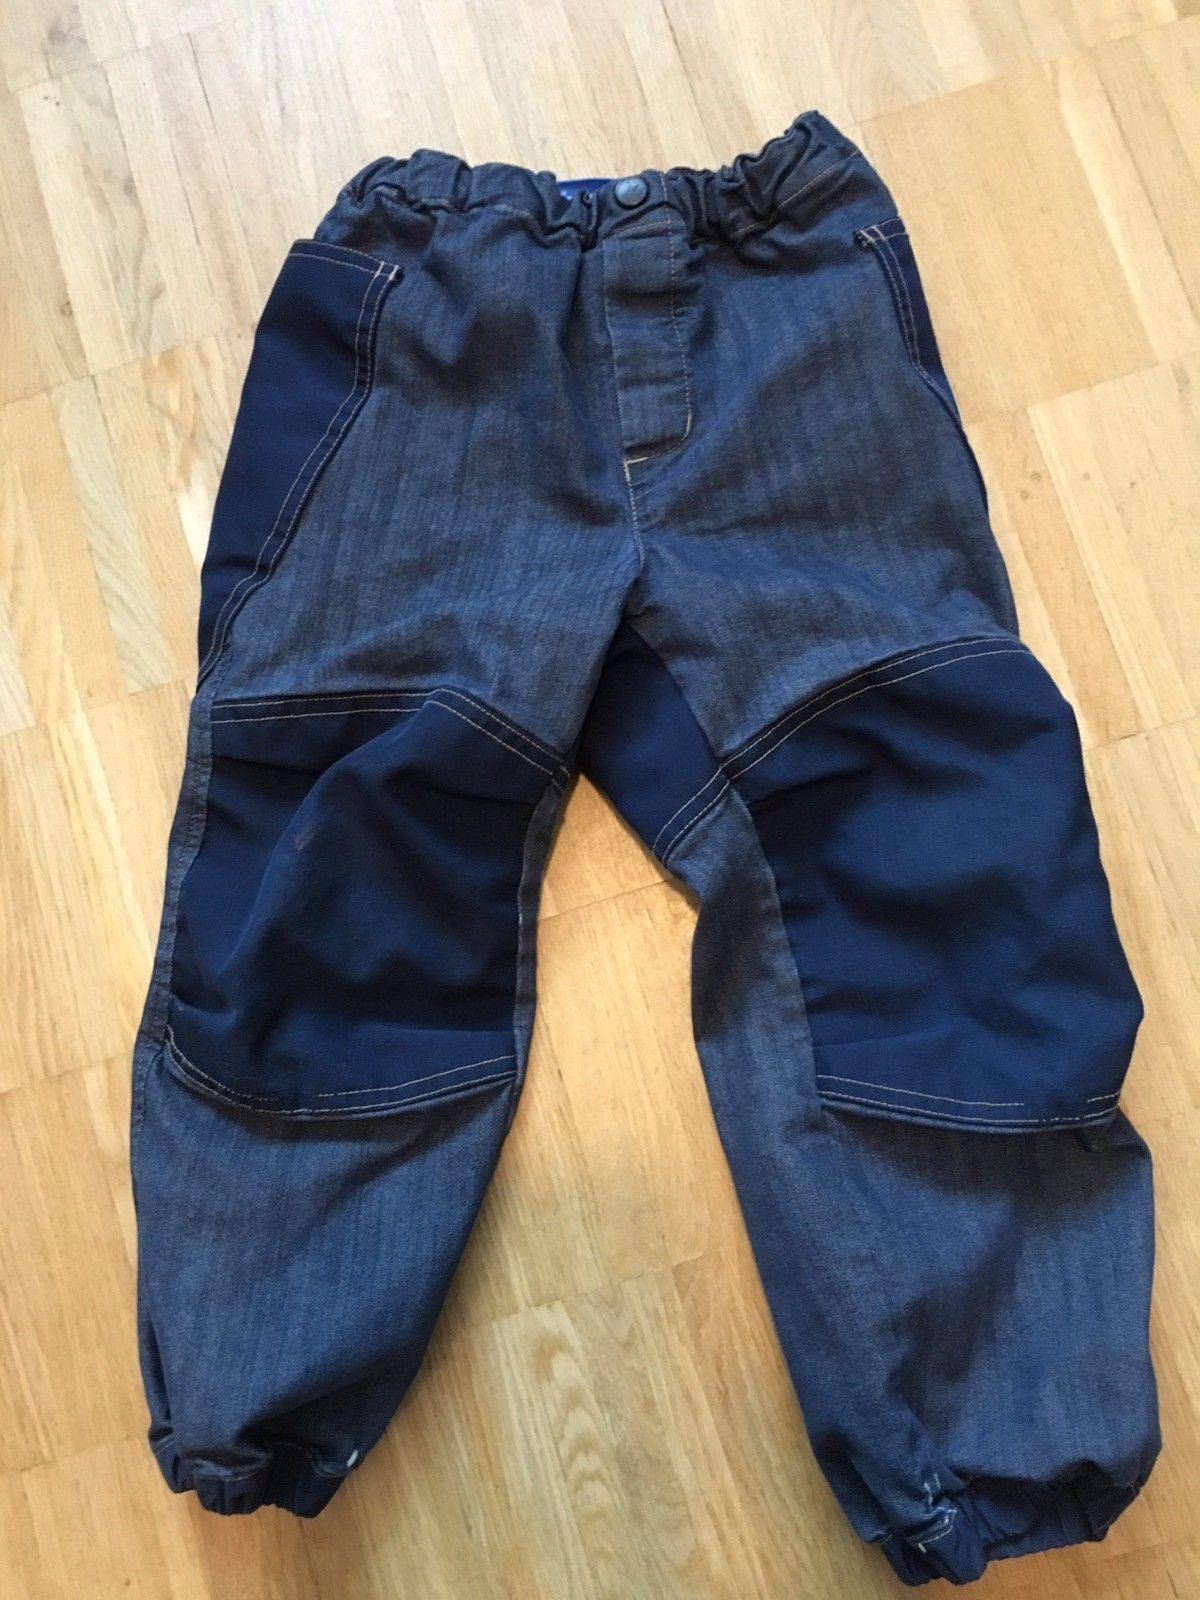 finkid KUU * denim jeans navy * 110/120 (5-6J)